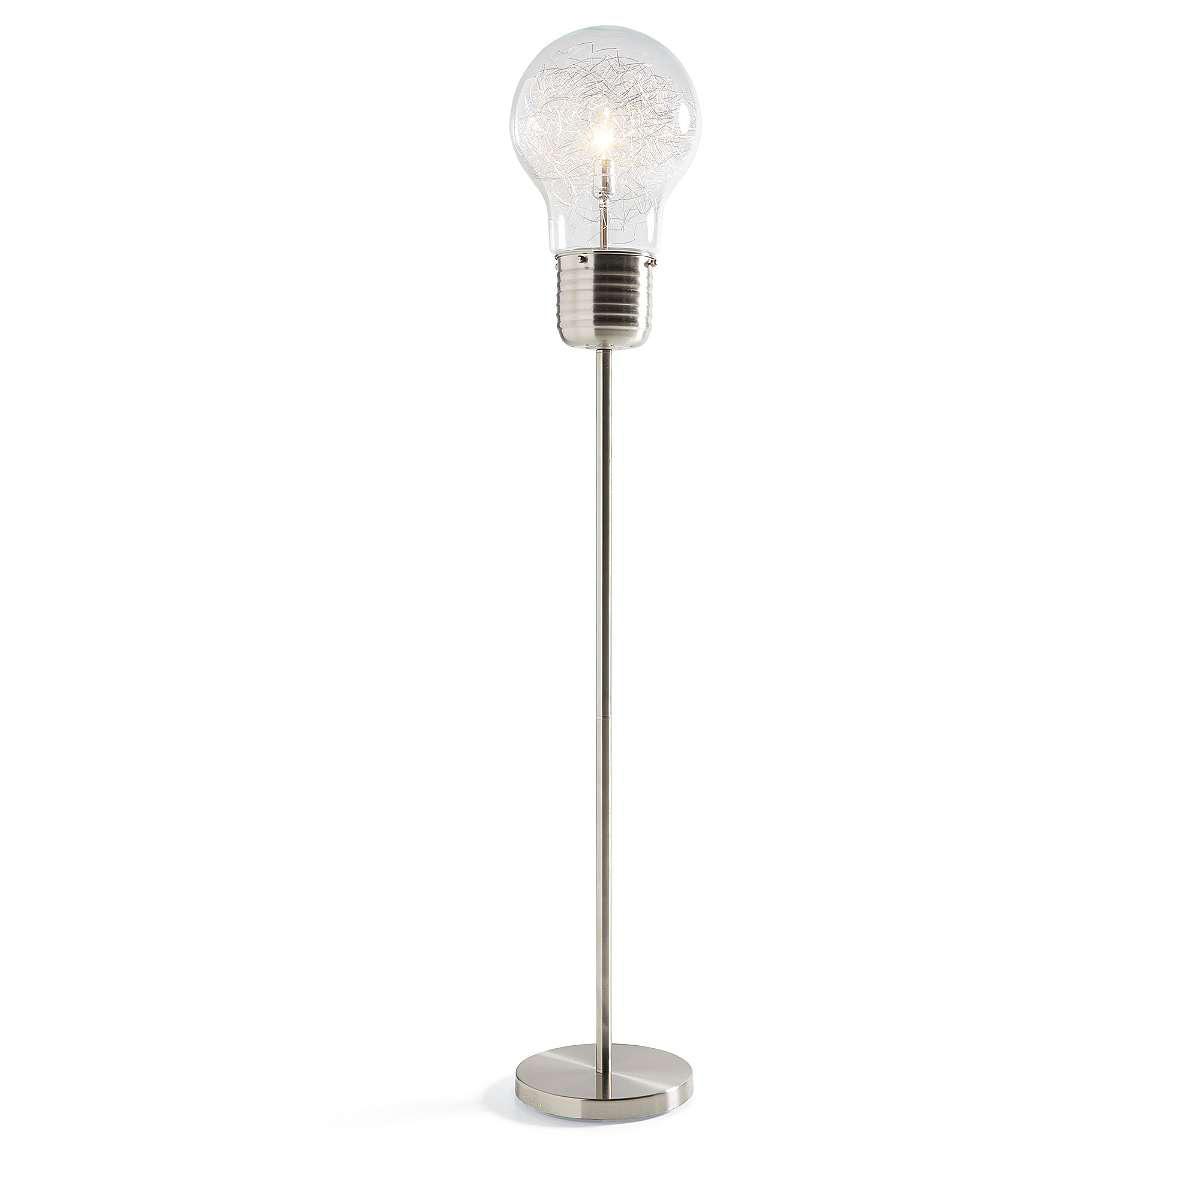 bulb lamp photo - 2